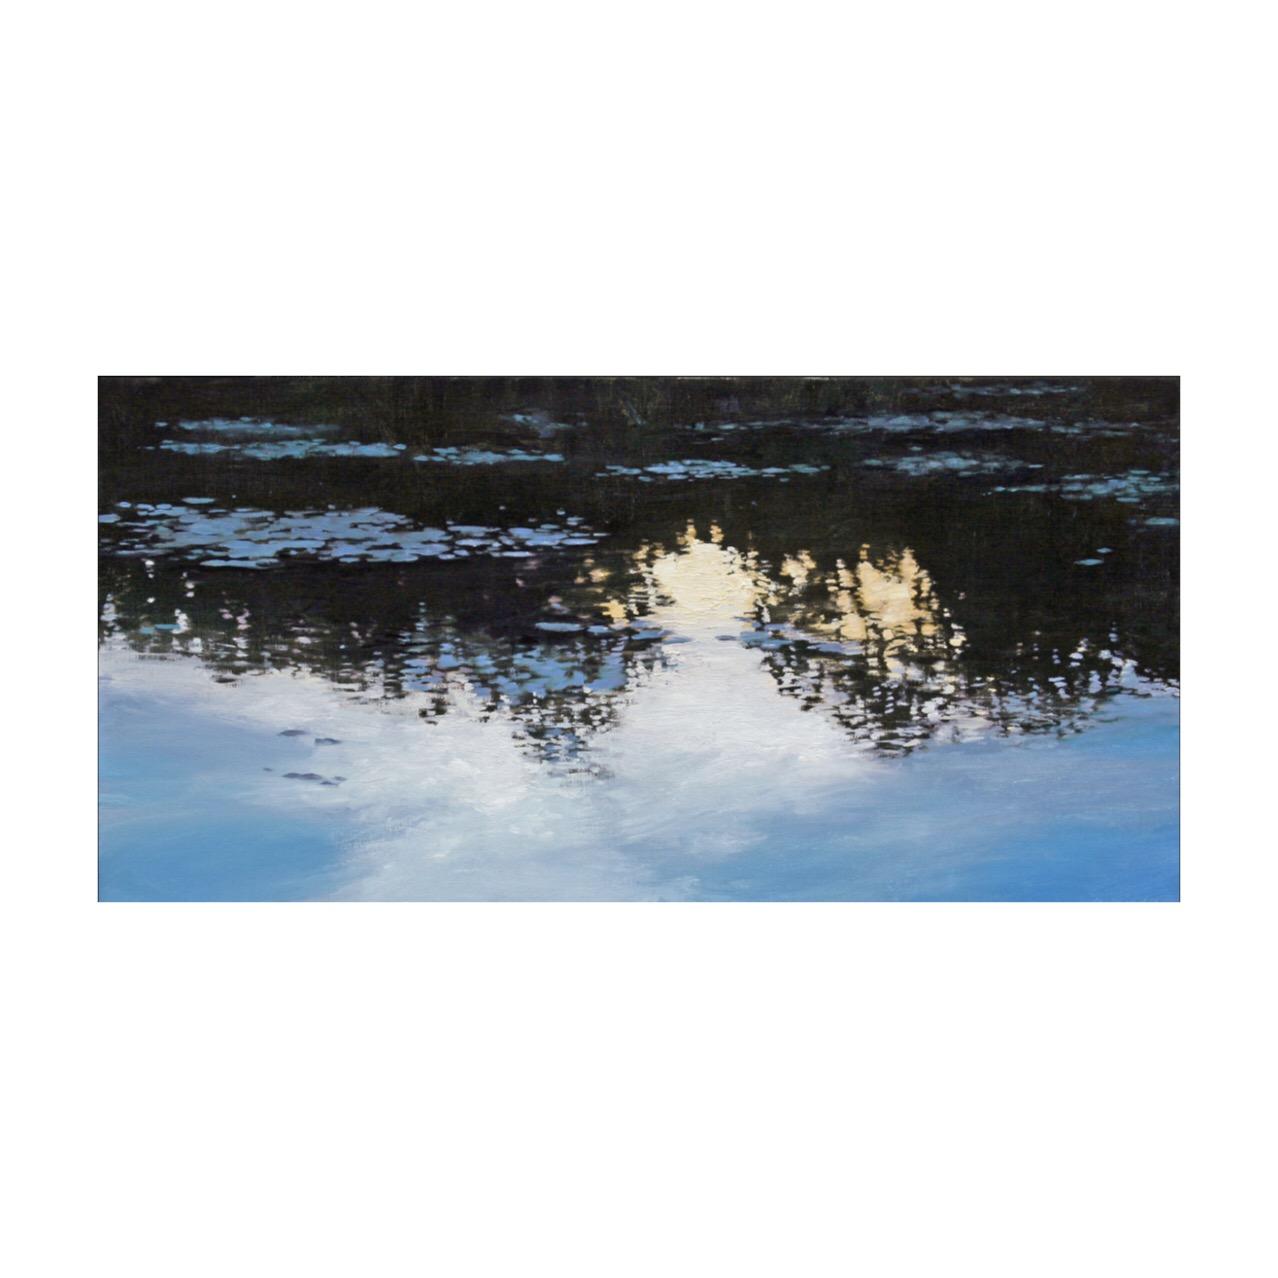 Shimmering Light on Lake Okinoka